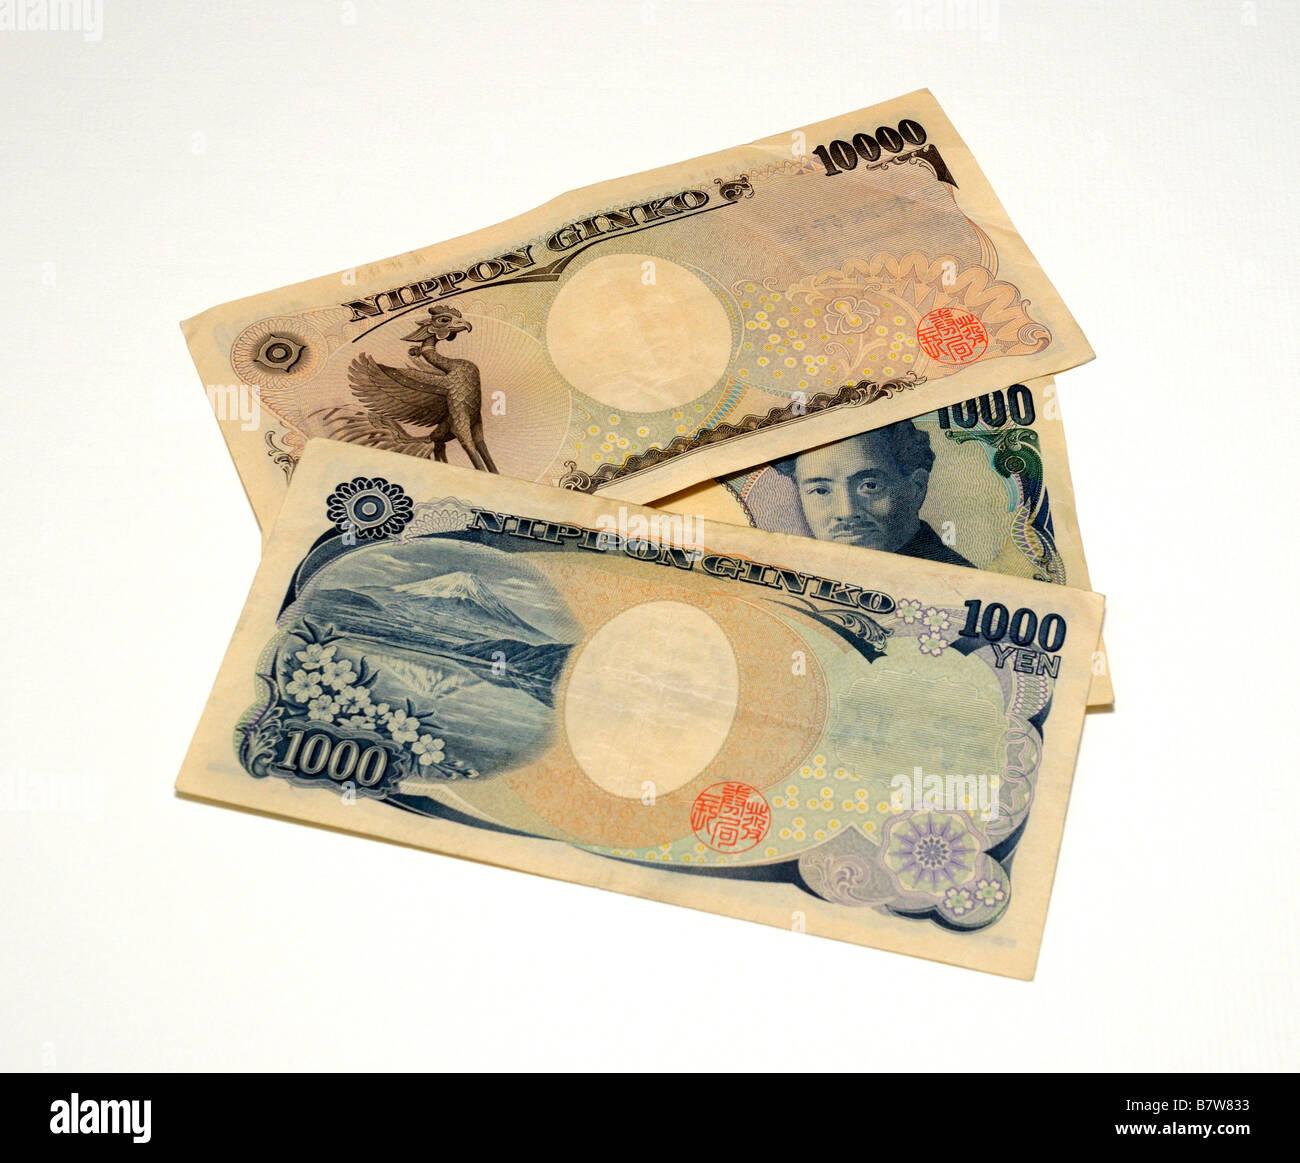 Japan Bank Notes - Stock Image